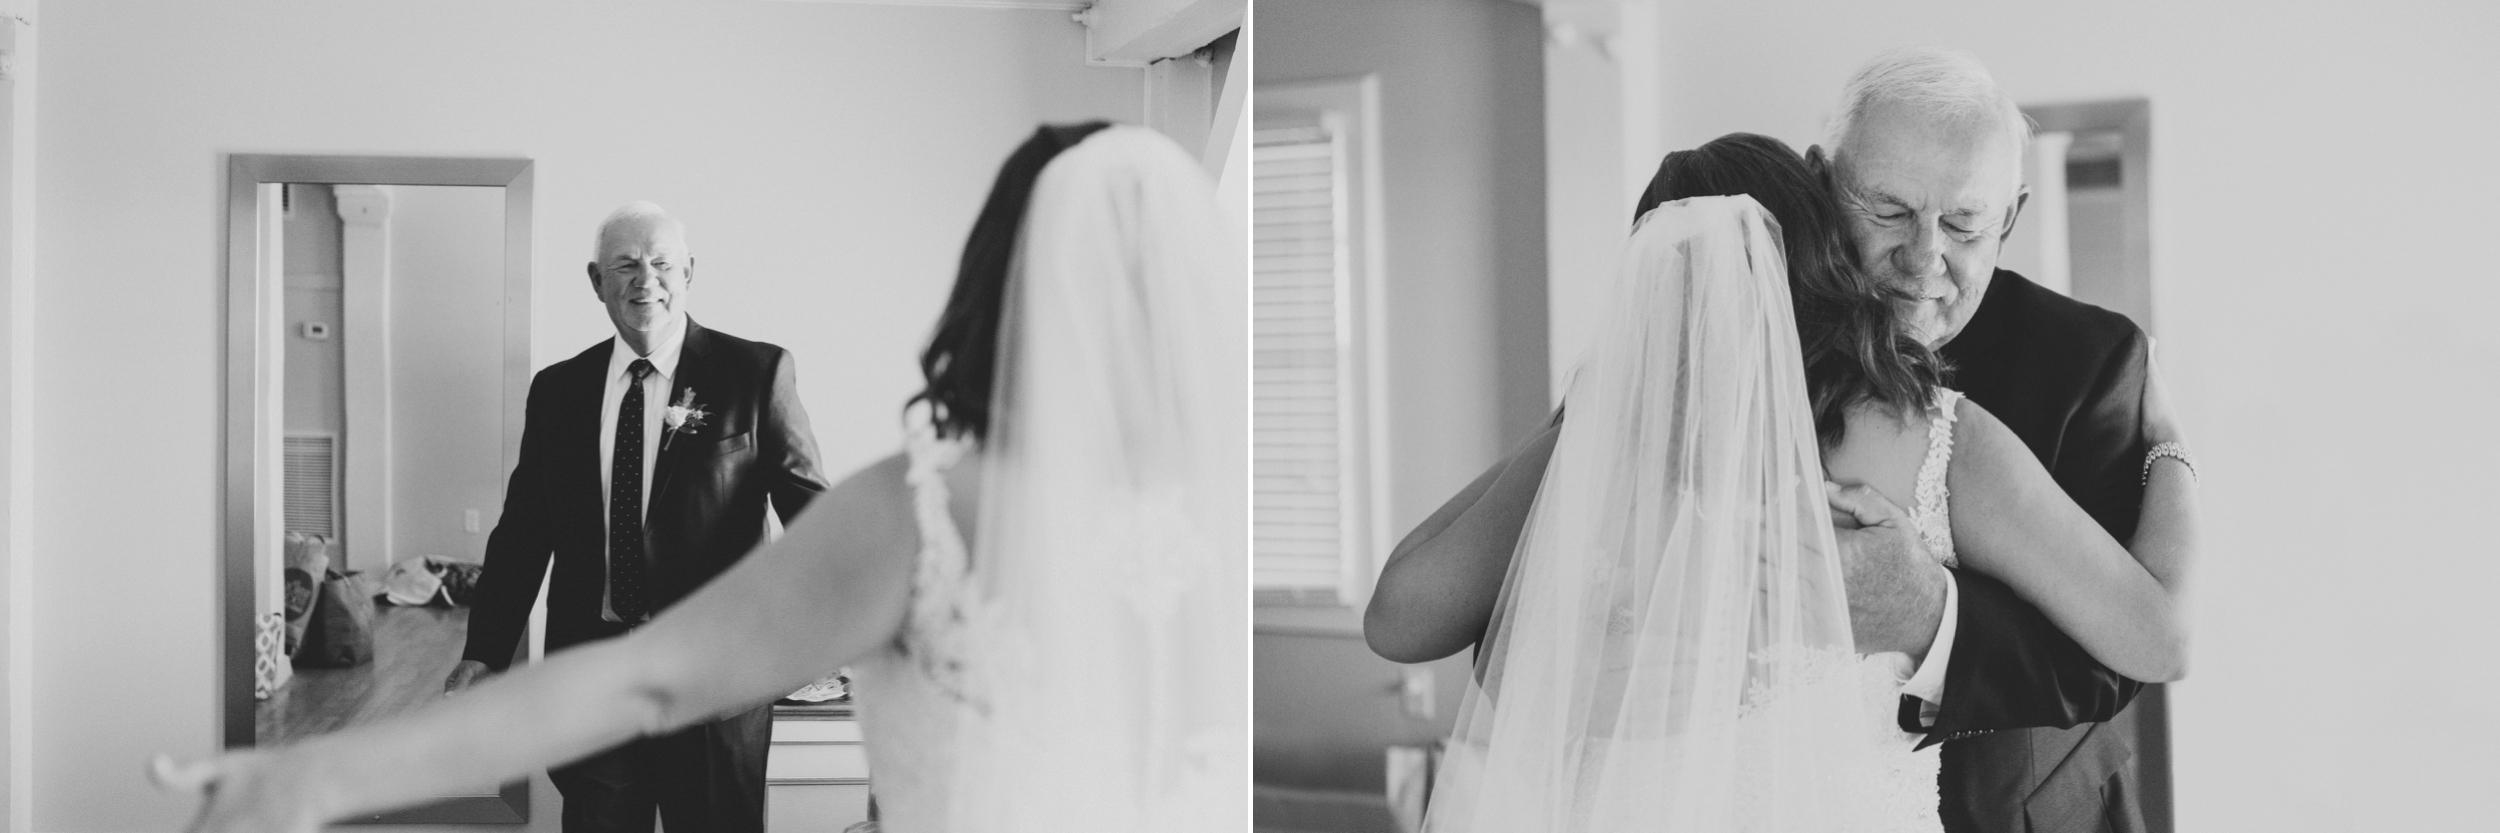 Charleston-wedding-photographer-38.jpg